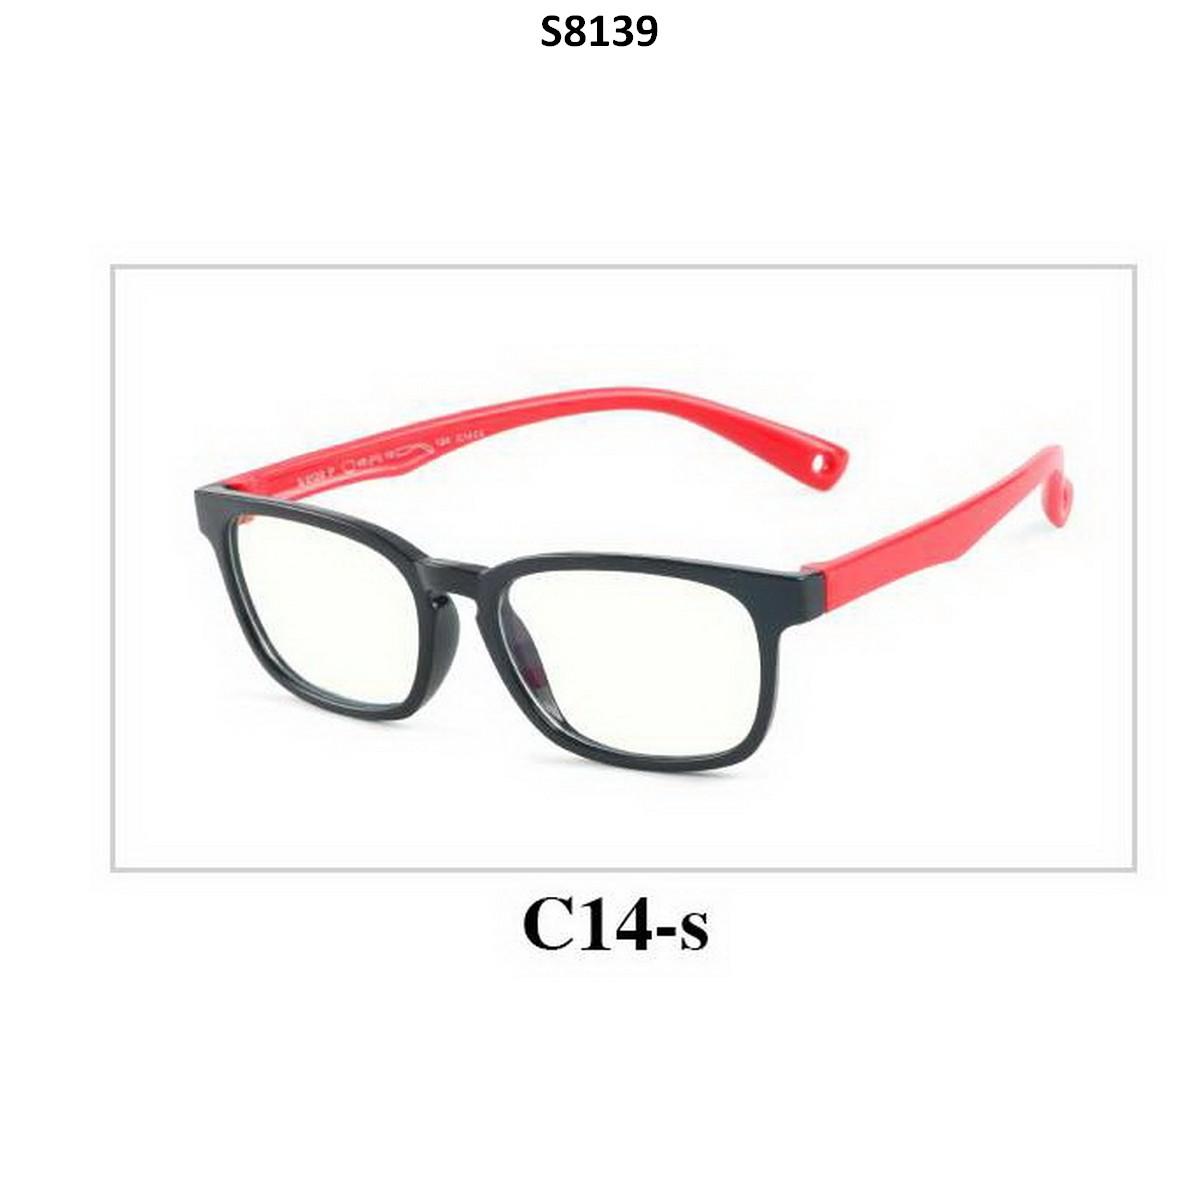 Kids Blue Light Blocker Computer Glasses Anti Blue Ray Eyeglasses S8139C14